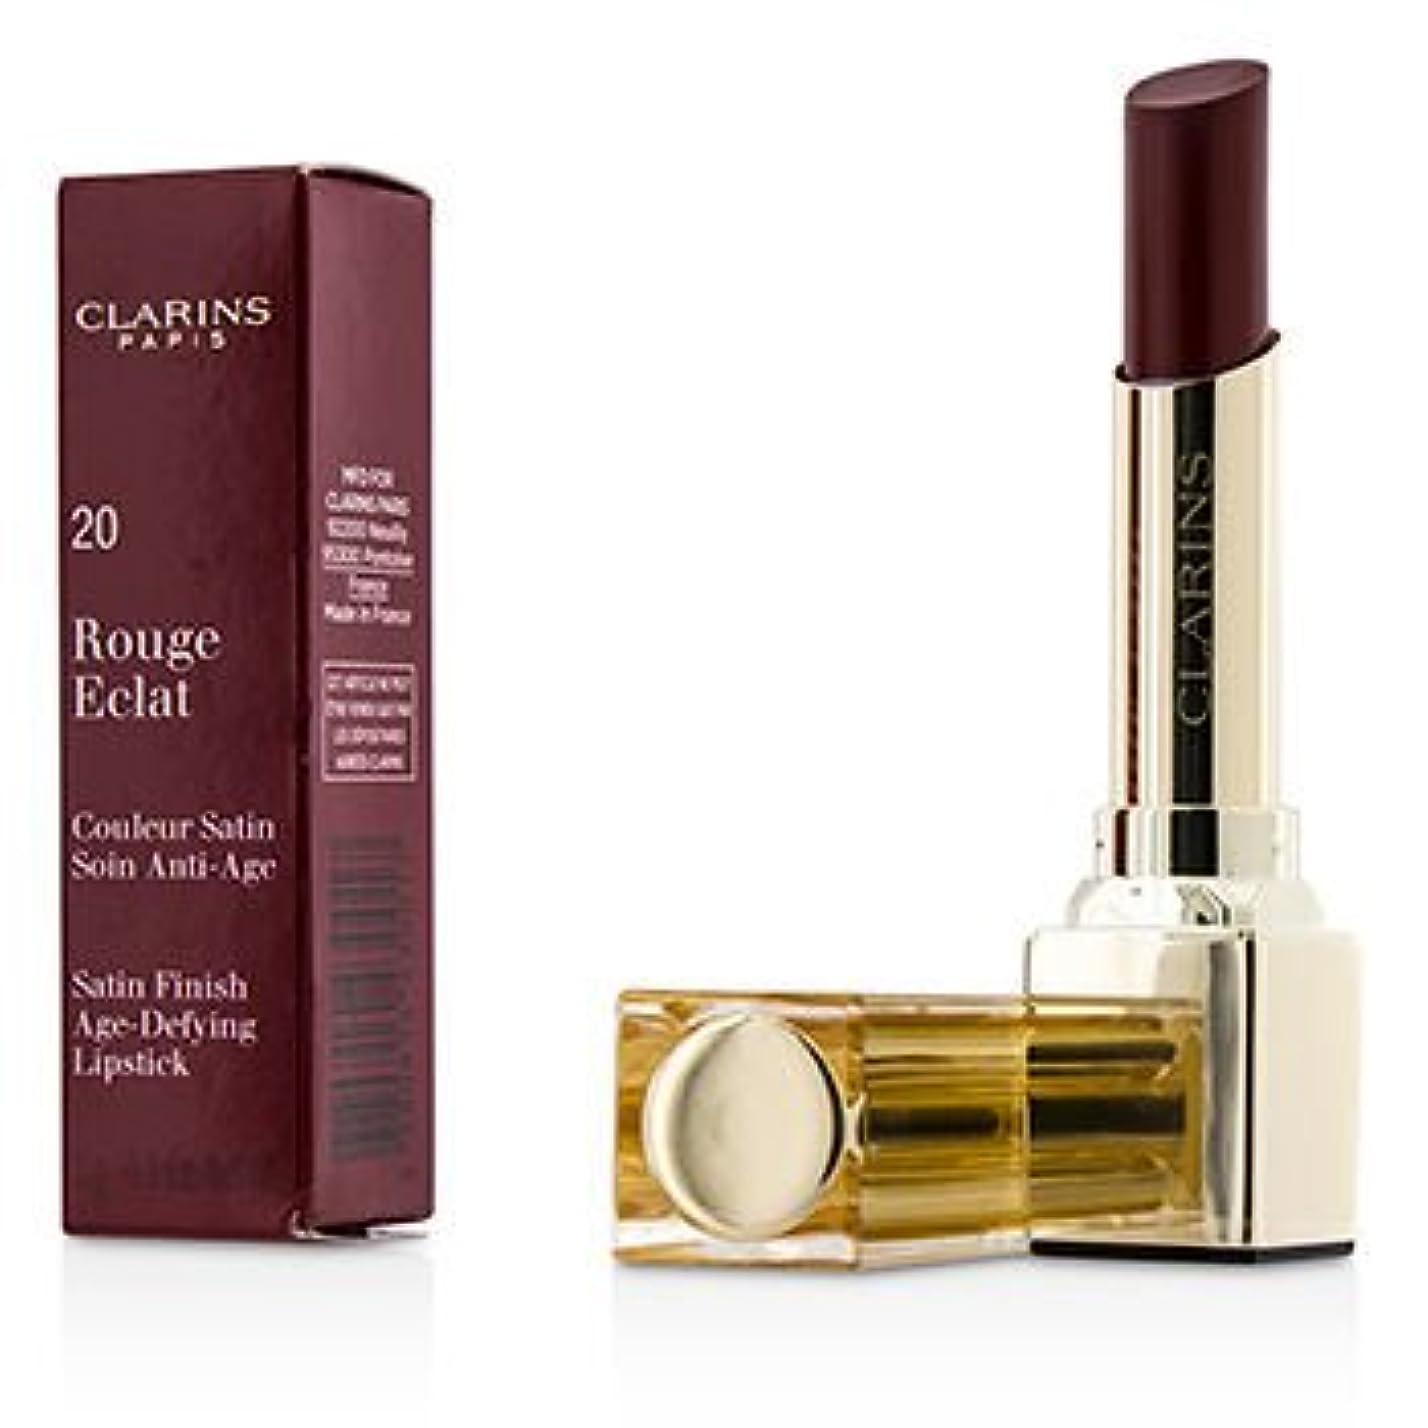 農学根拠快適[Clarins] Rouge Eclat Satin Finish Age Defying Lipstick - # 20 Red Fuchsia 3g/0.1oz